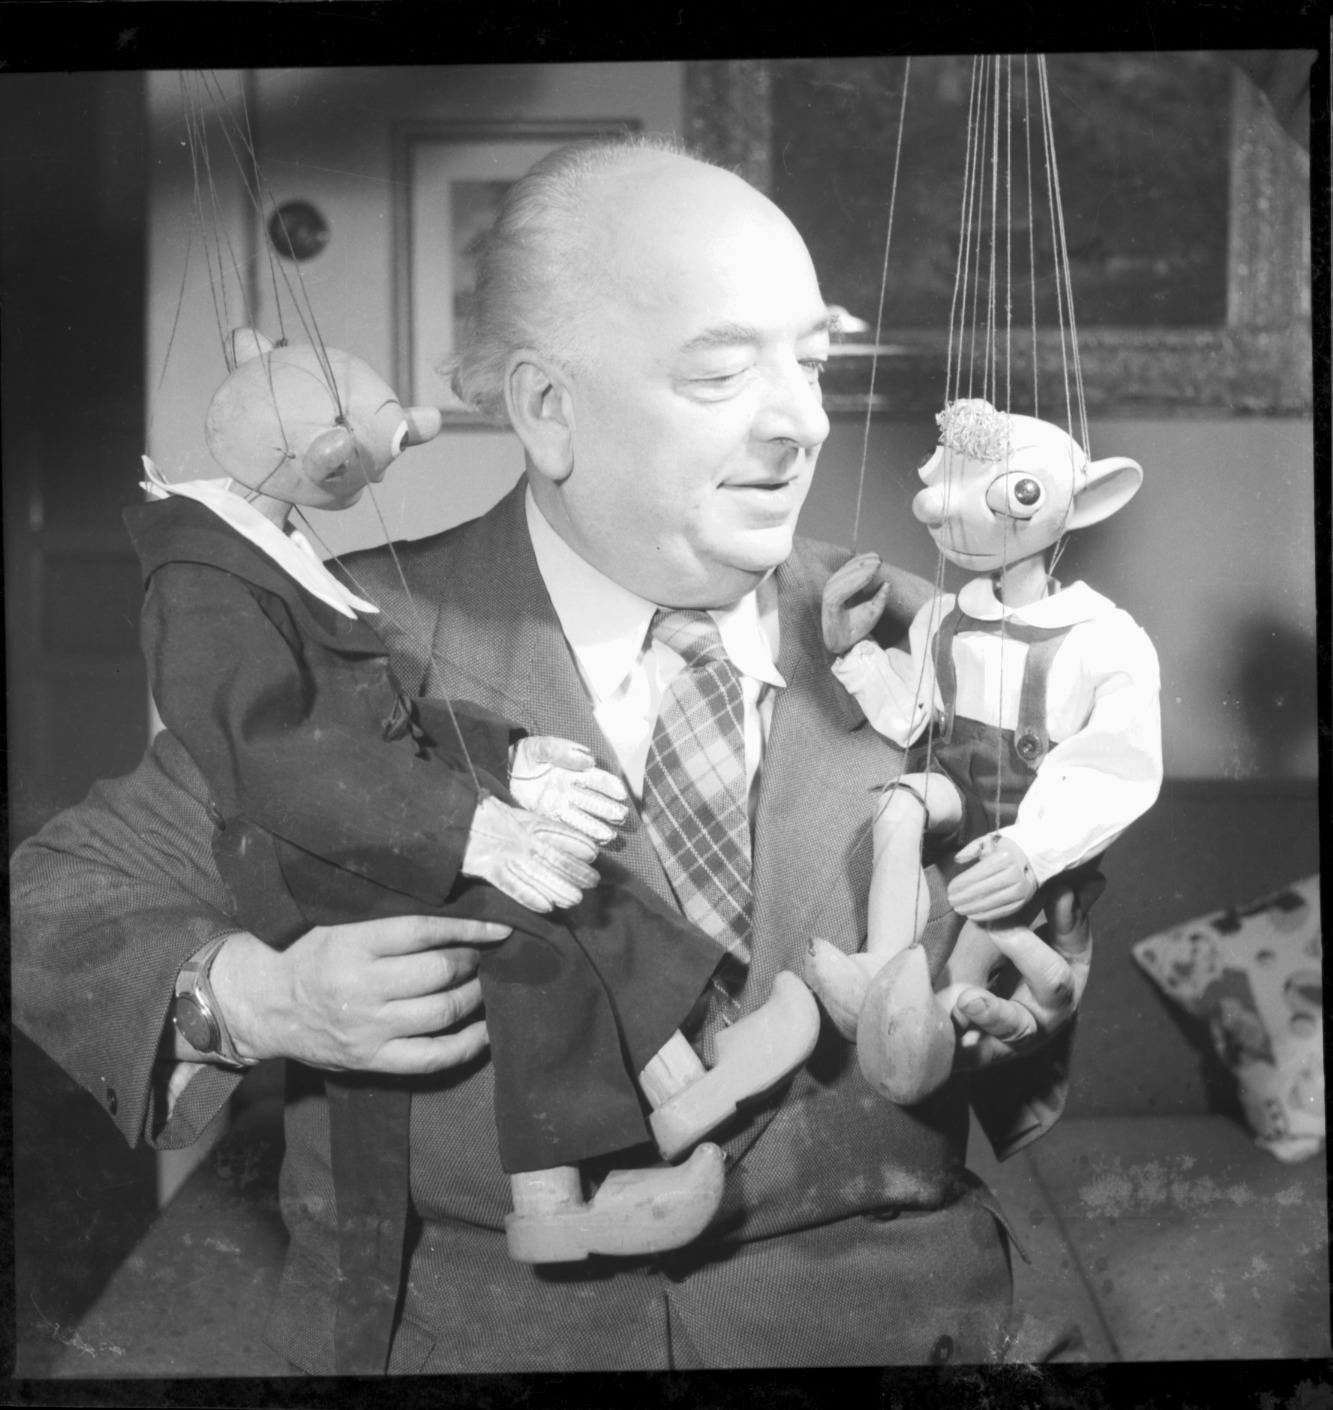 Josef Skupa (1892-1957), titiritero, artista visual y autor de obras para el teatro de títeres <em>c</em>he<em>c</em>o, <em>c</em>on sus títeres de hilos populares, Spejbl y Hurvínek. Fotografía cortesía de Archivo de Loutkář